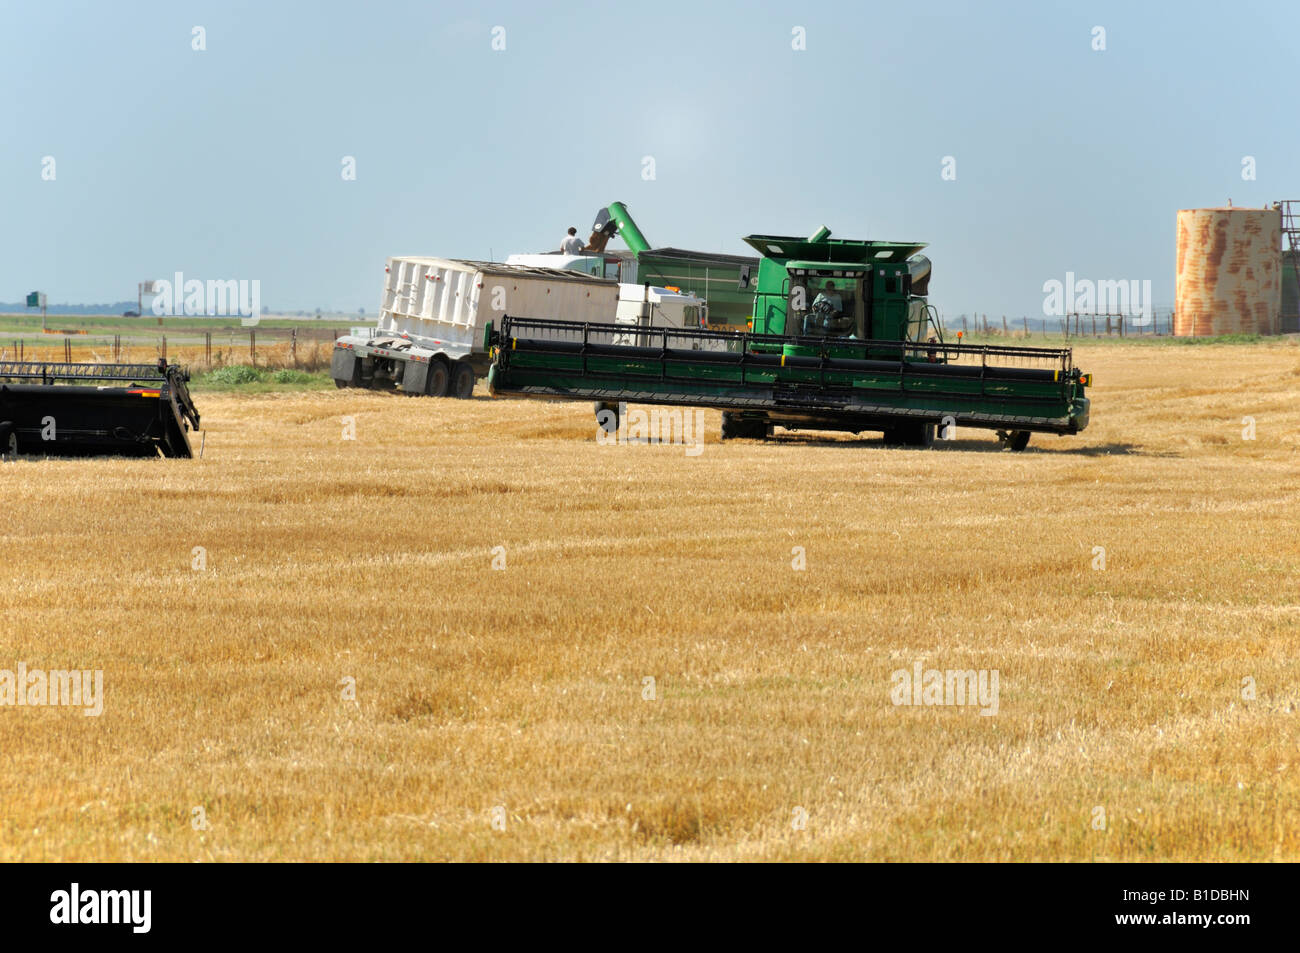 A custom harvest crew cuts wheat in central Oklahoma, USA, North America. - Stock Image